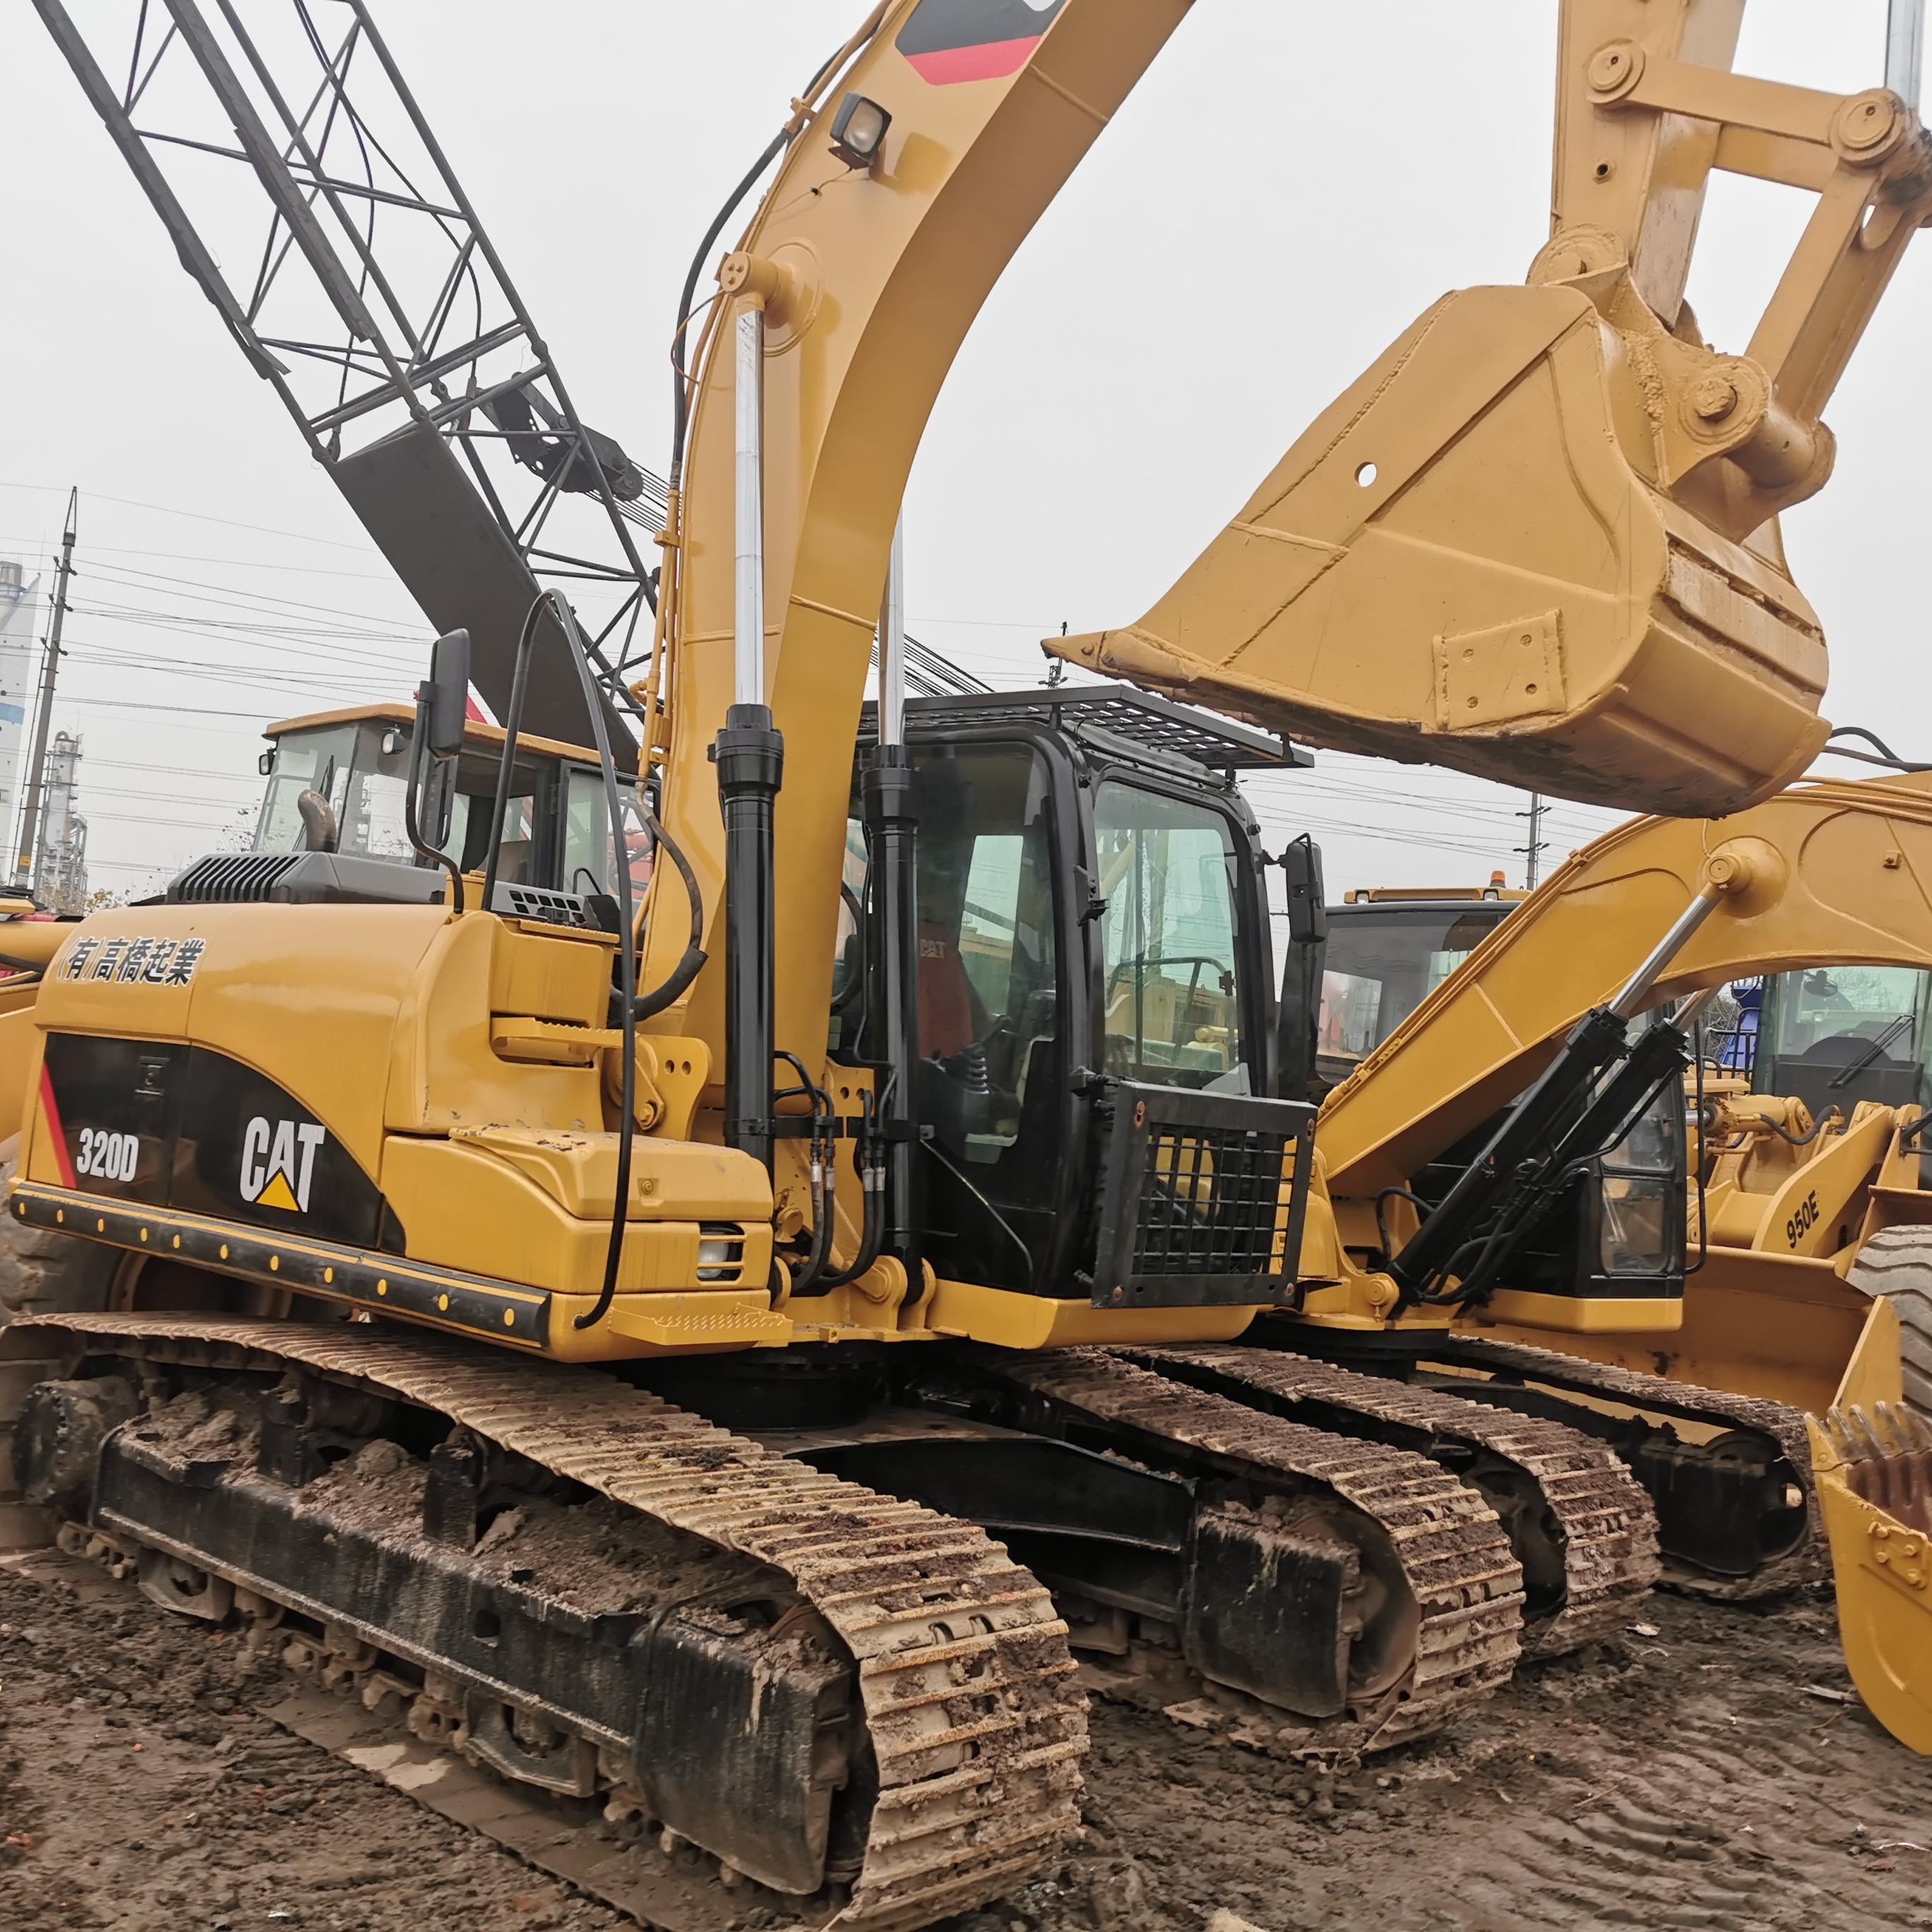 caterpillar machinery 320d excavator in high quality for sale buy cat excavator used cat 320 excavator caterpillar machinery product on alibaba com